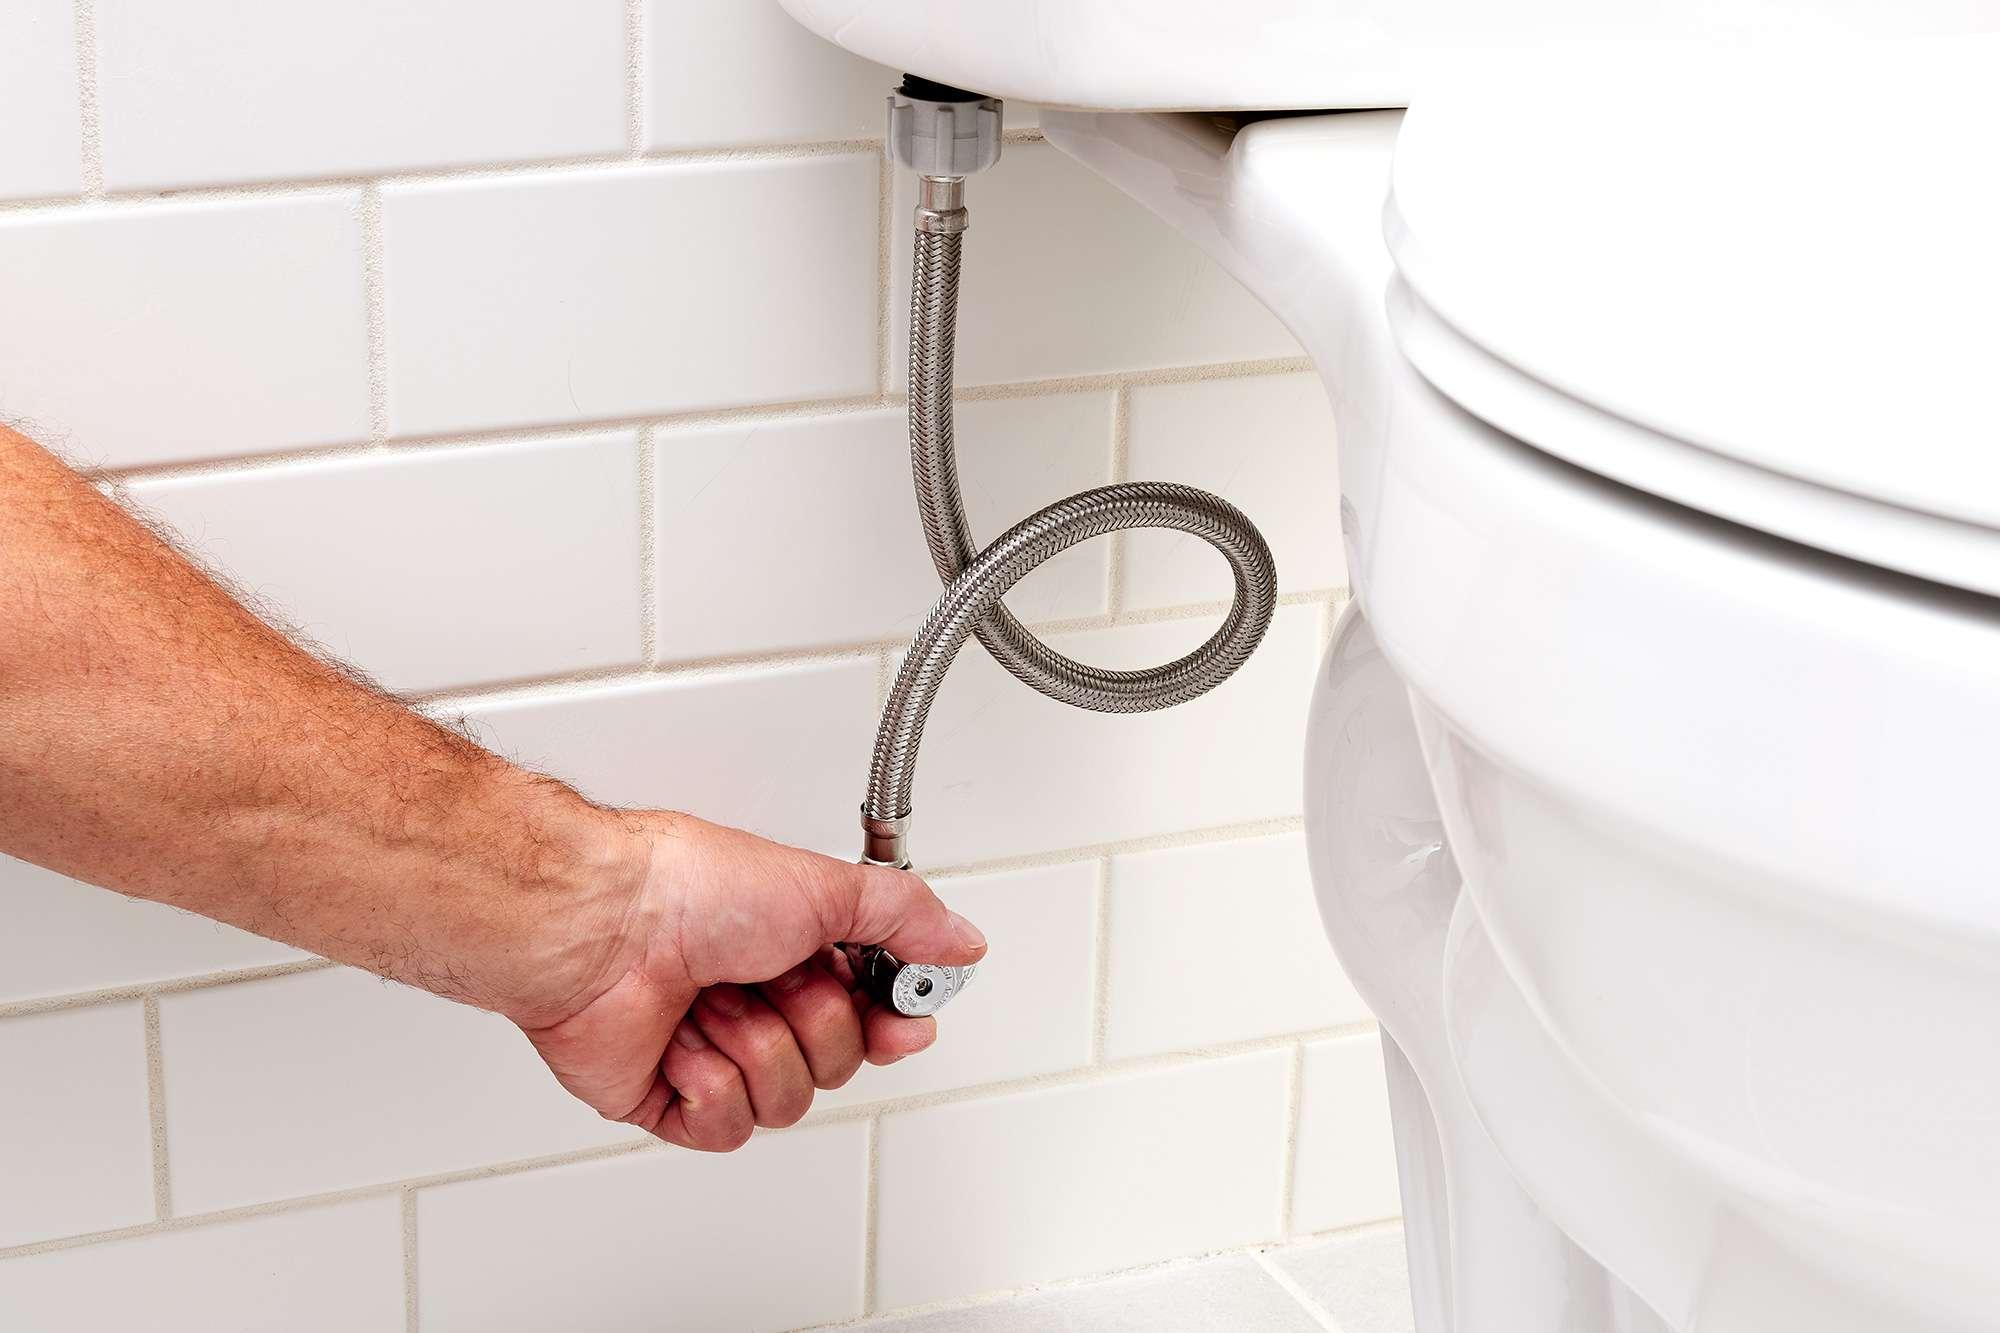 Toilet water shut off by turning handle on shutoff valve